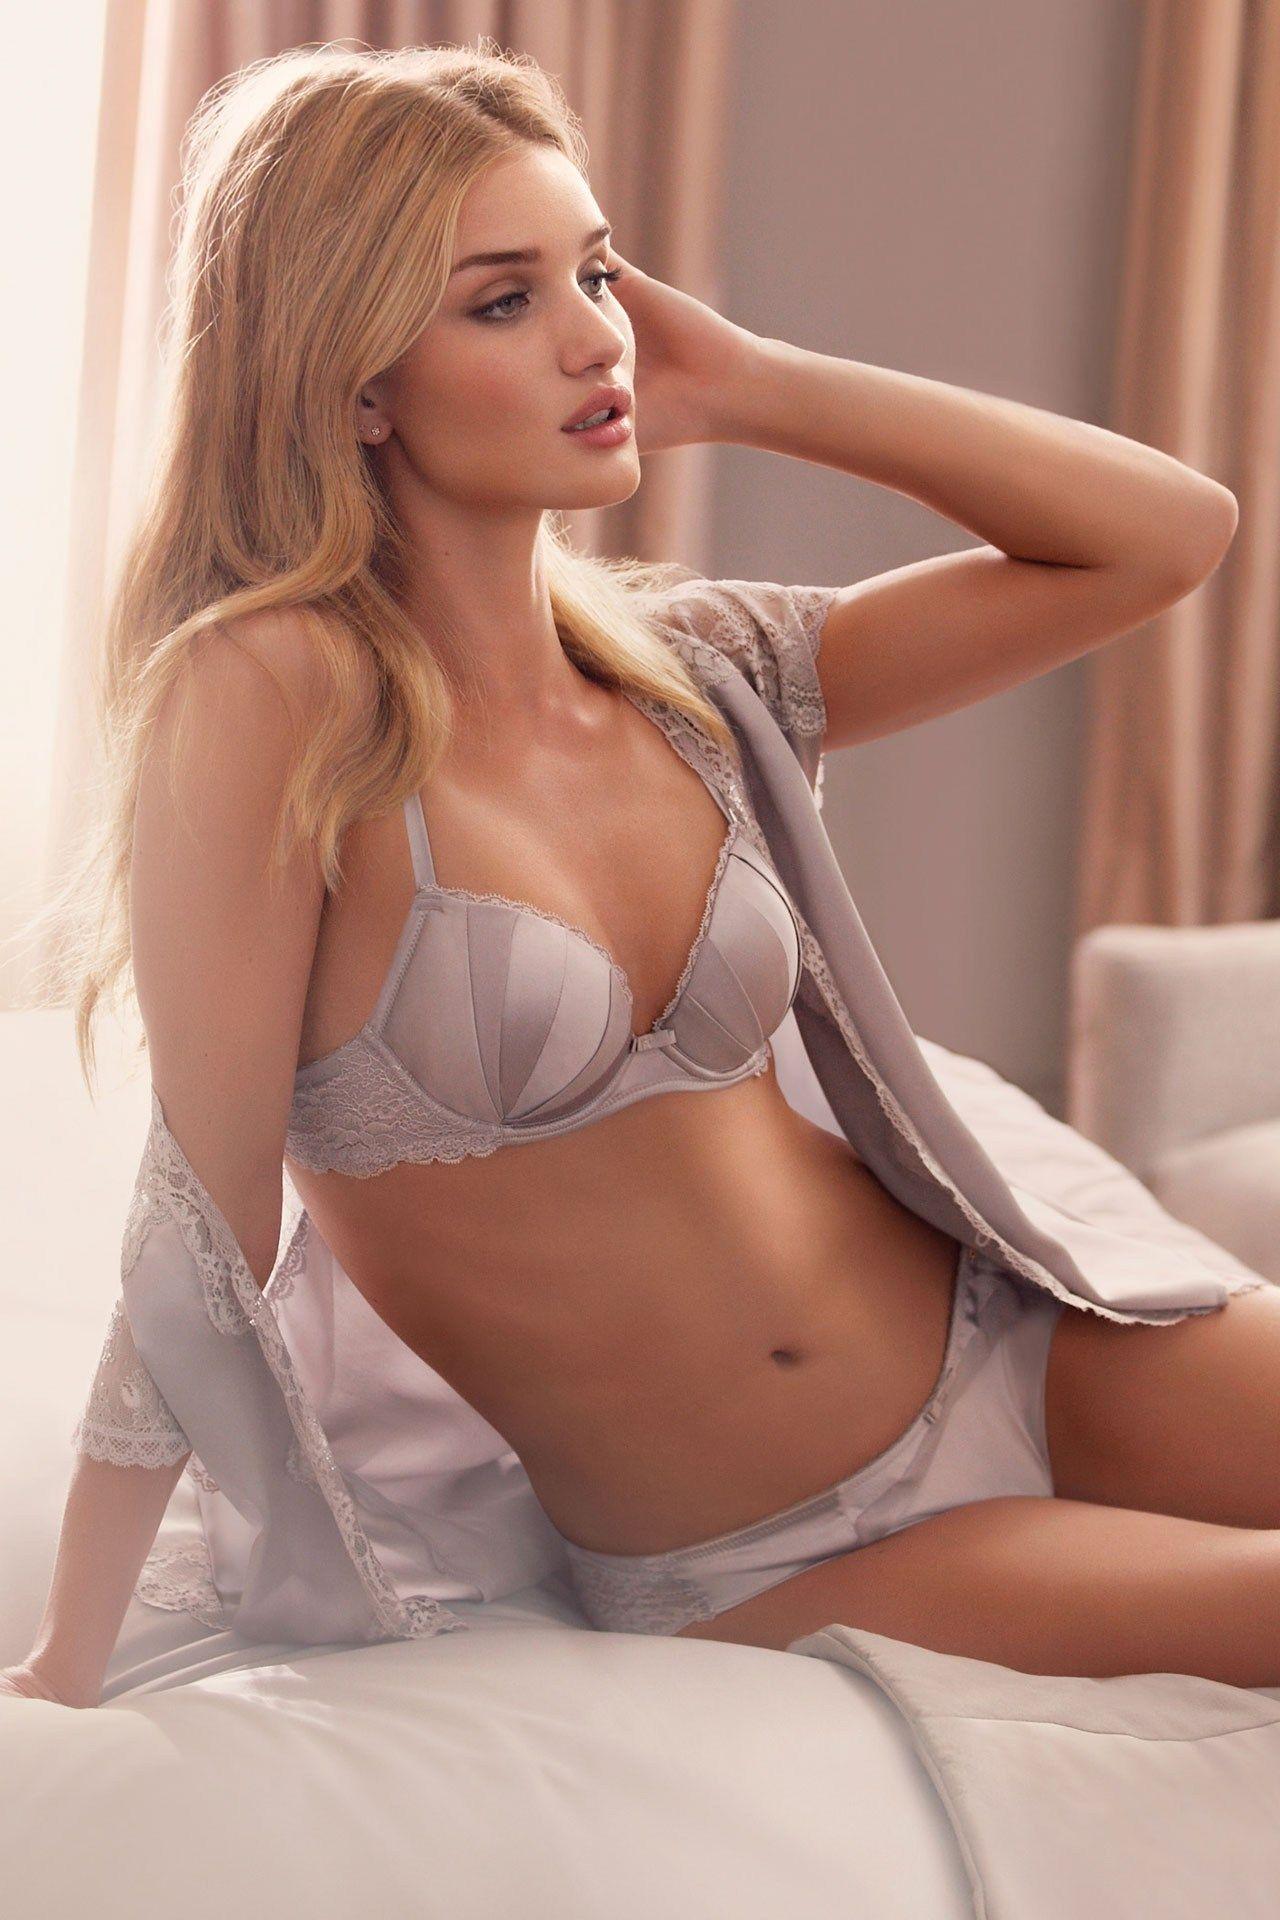 Classy gray - love that bra